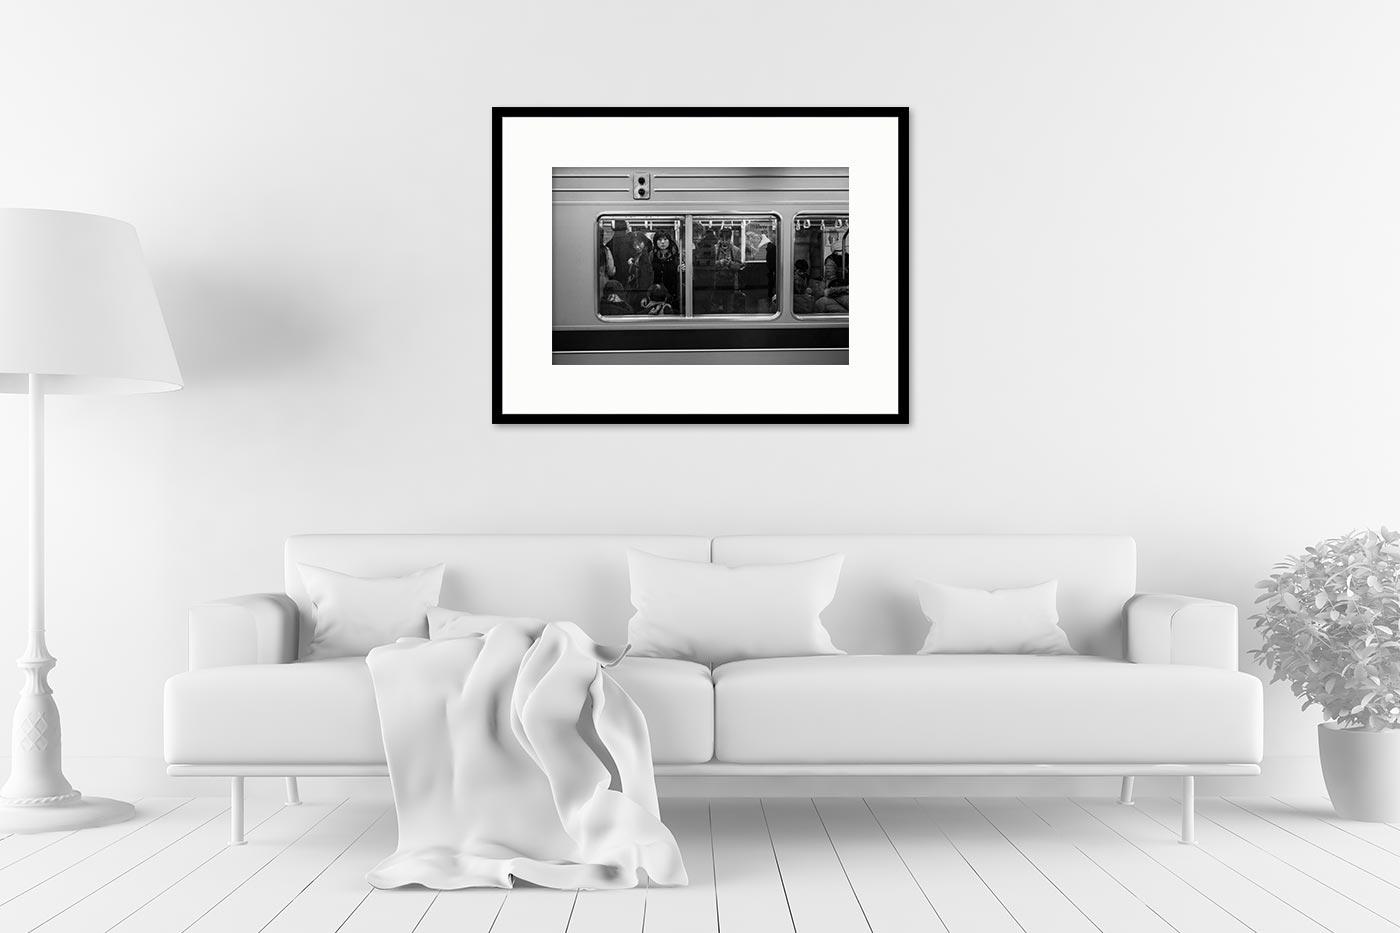 Cadre galerie 60x80 7 PM